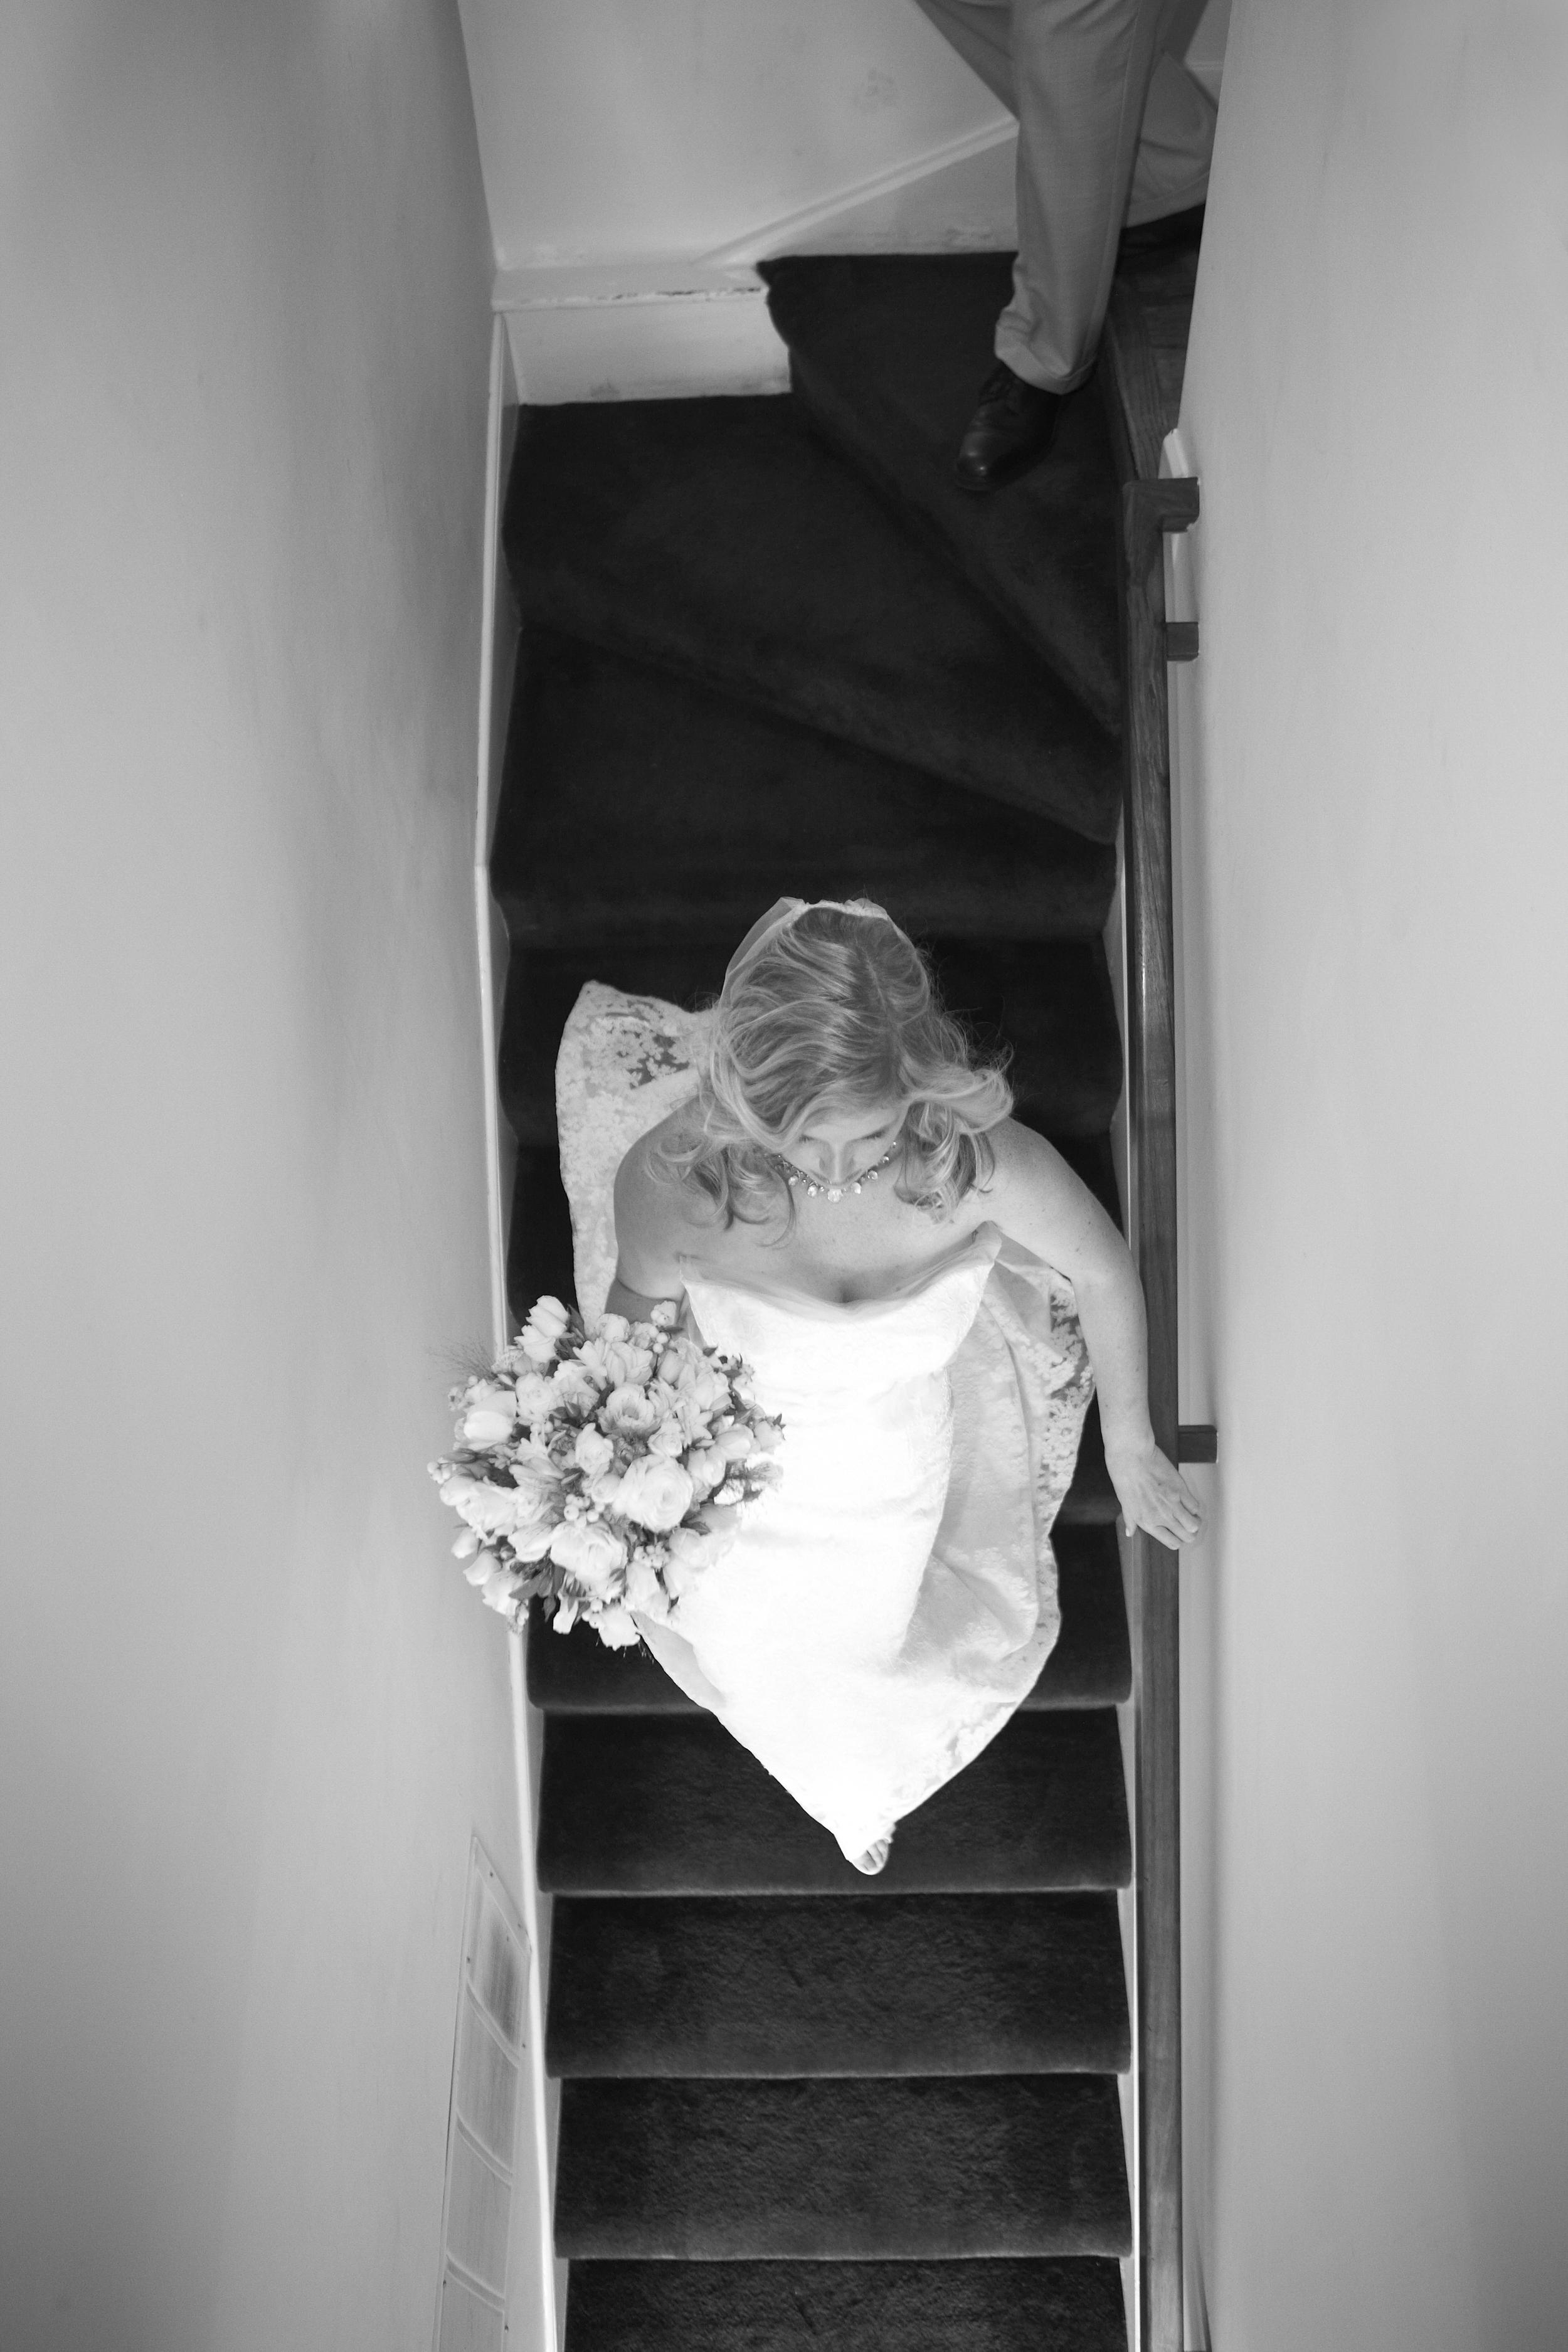 Sausilito Wedding | San Francisco Wedding Coordination by Bella Notte Events